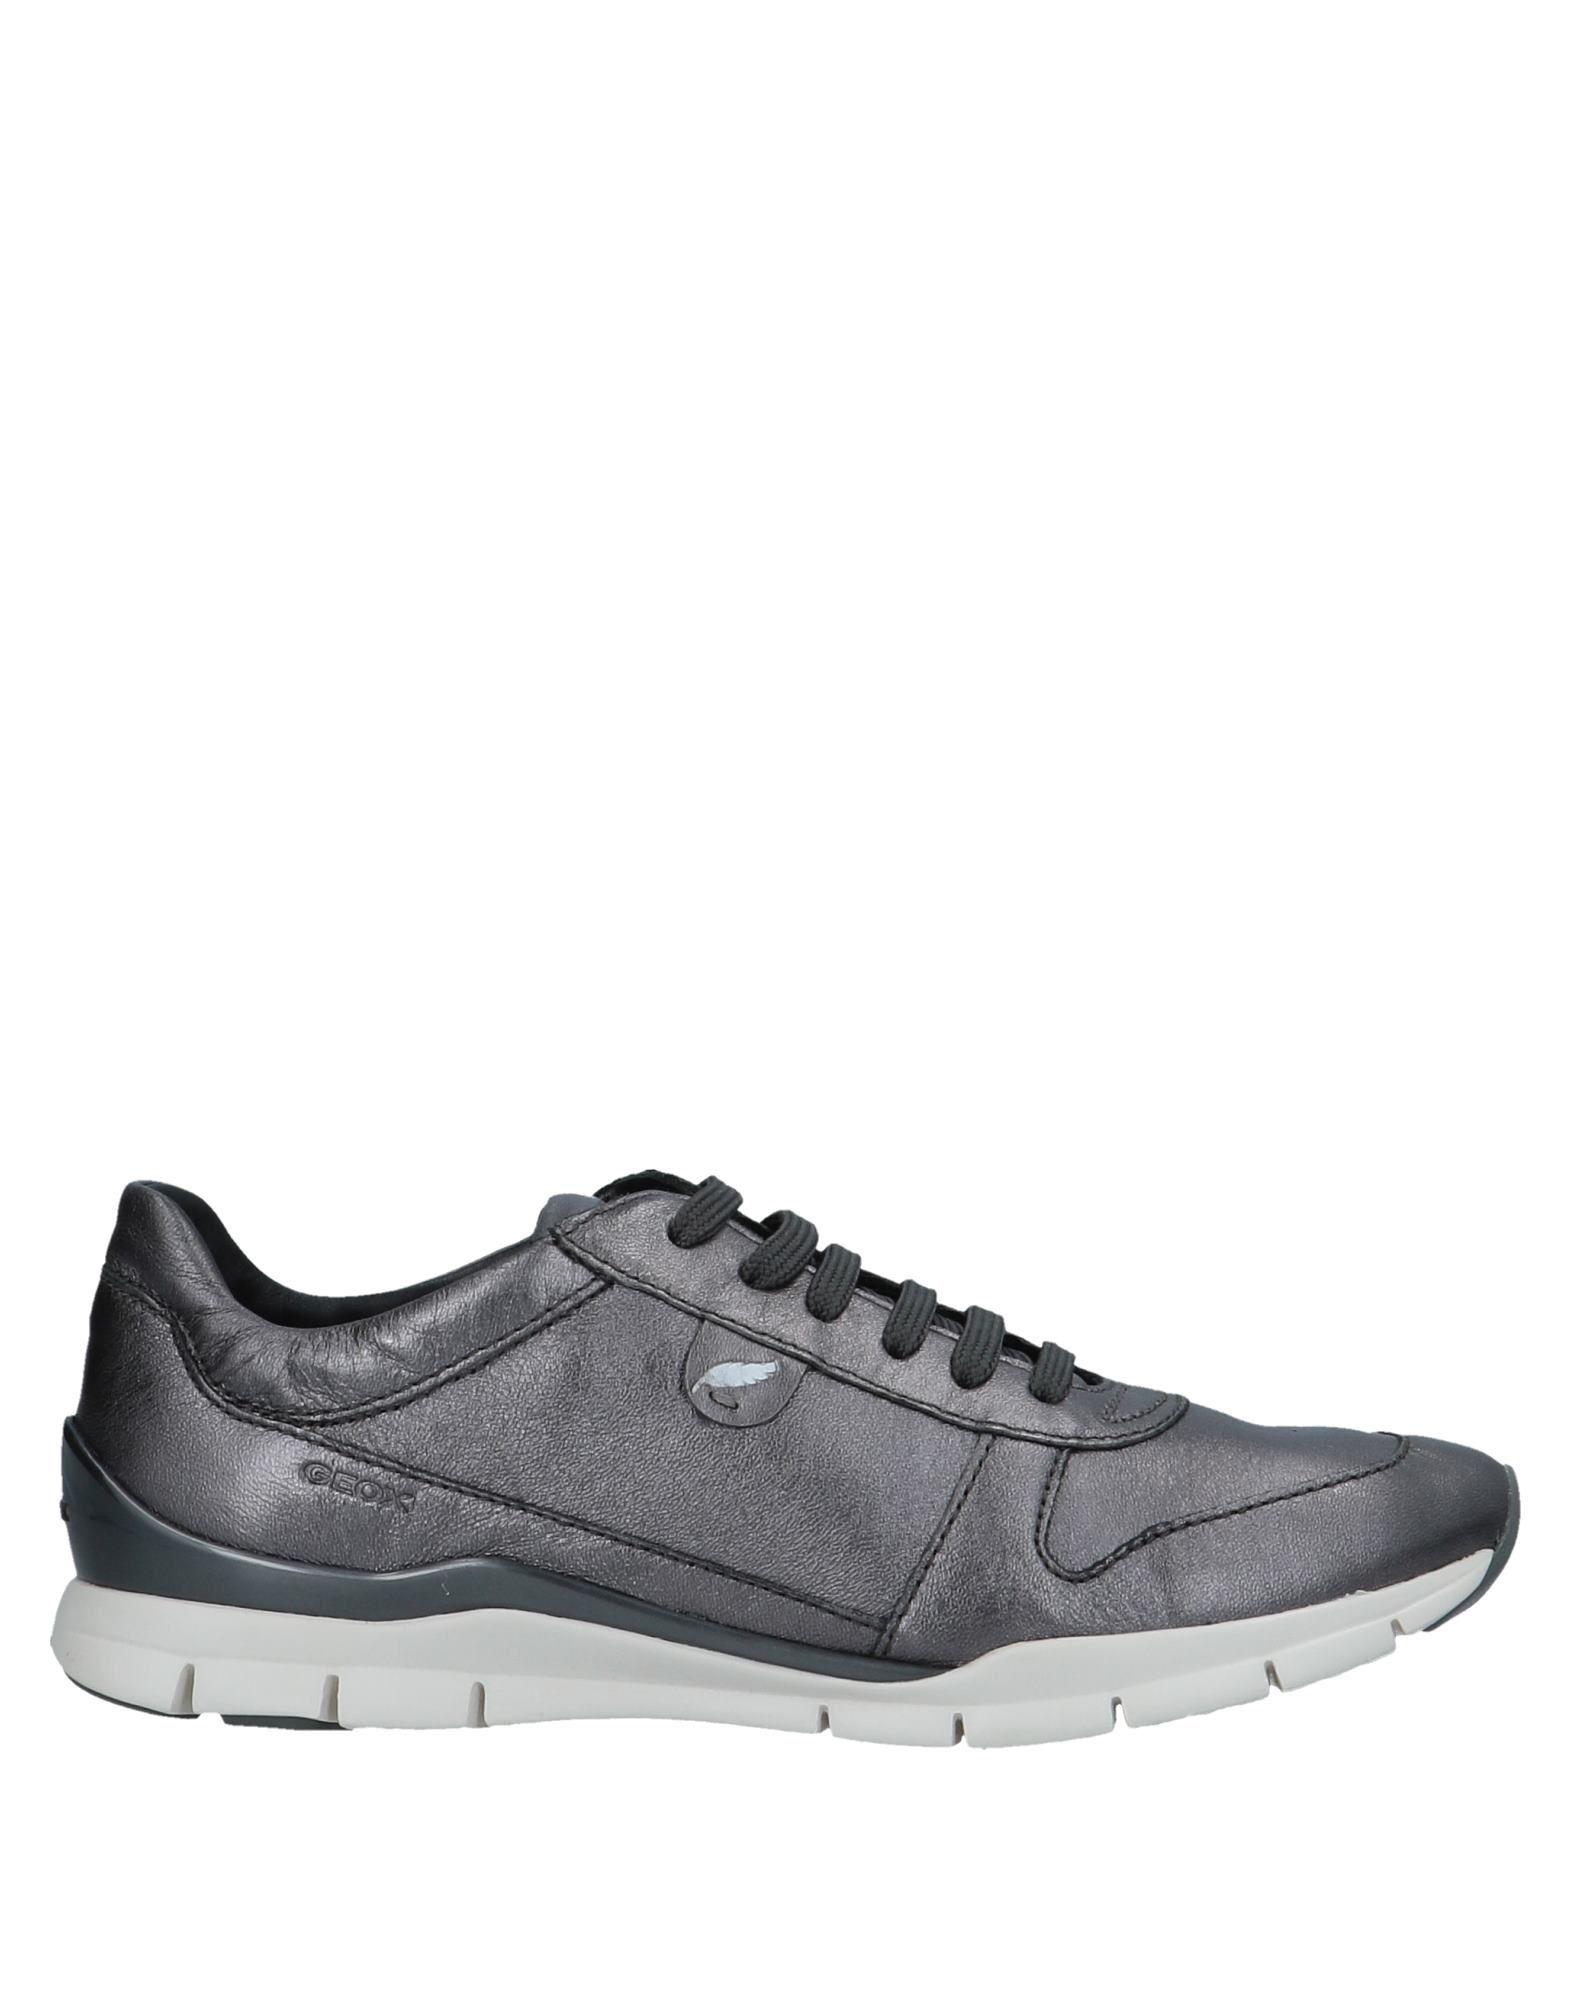 Geox Sneakers - Women Geox Sneakers online online online on  Canada - 11540469UE b15560